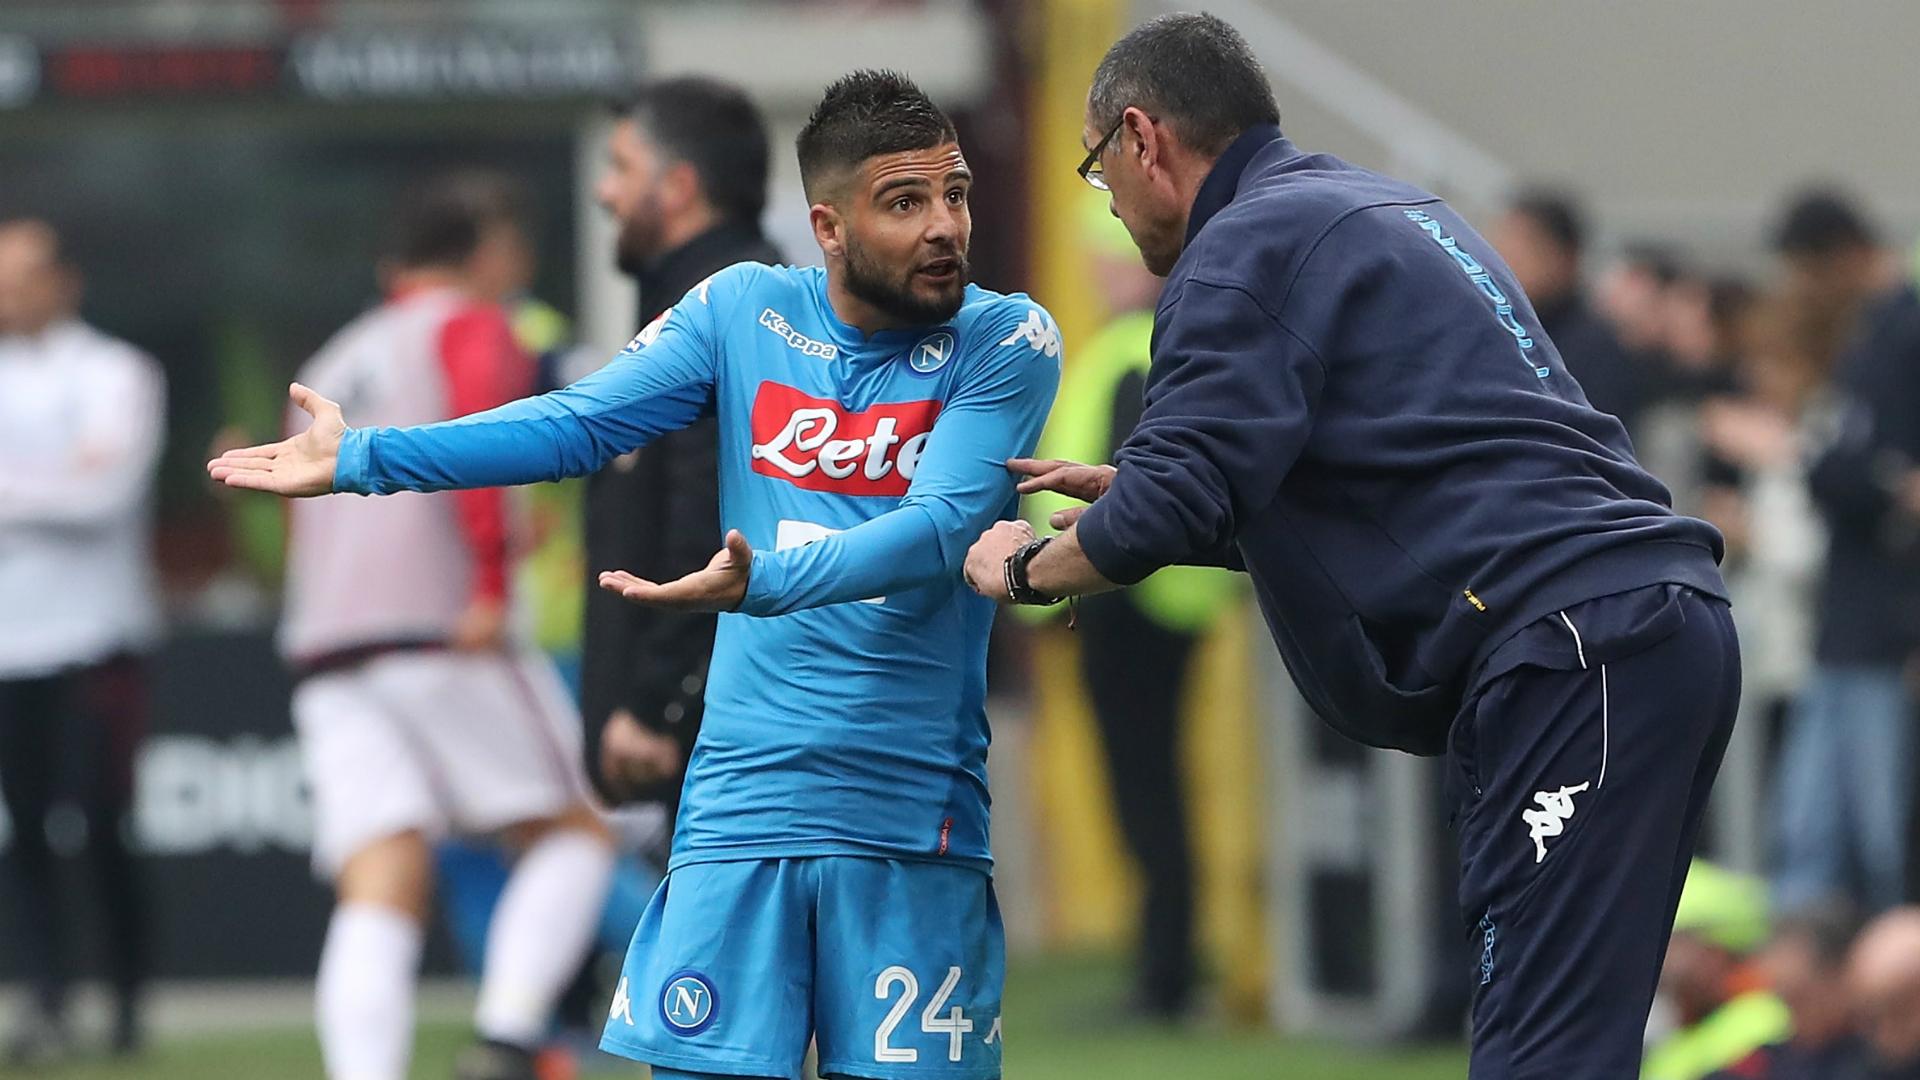 Sarri betrayed Napoli by joining Juventus – Insigne